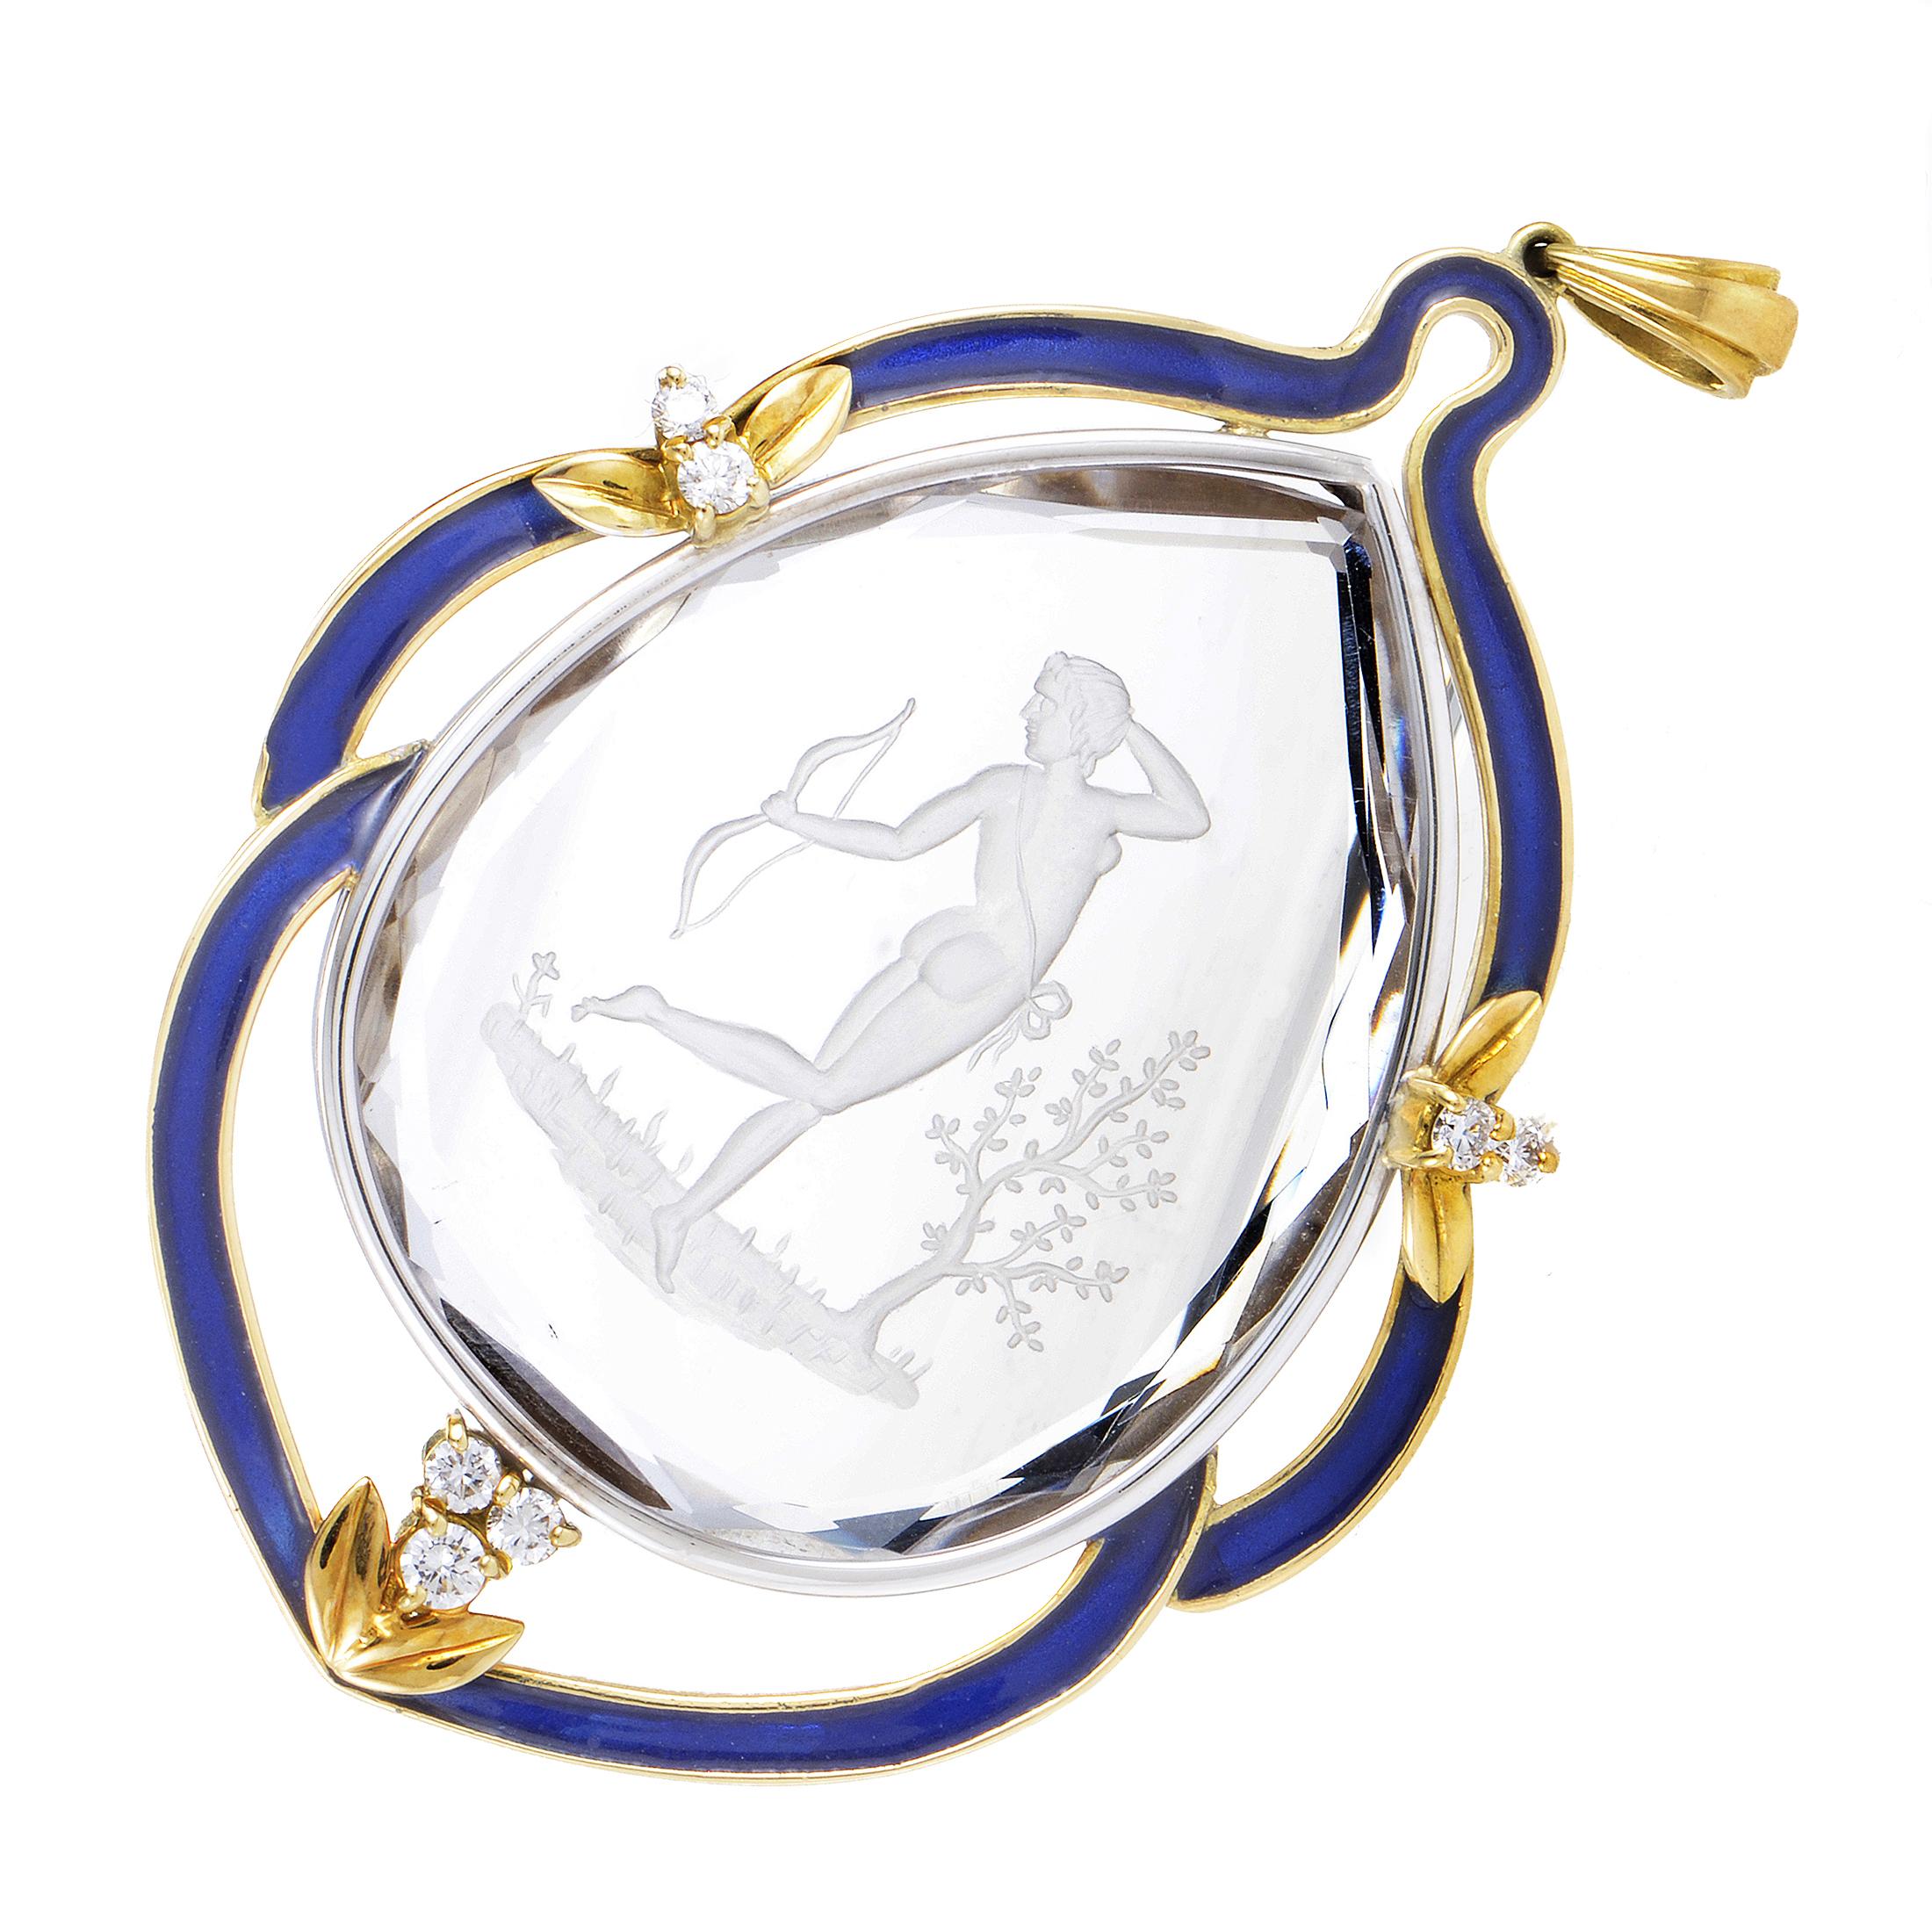 Women's 18K Multi-Tone Gold Diamond & Crystal Enameled Pendant